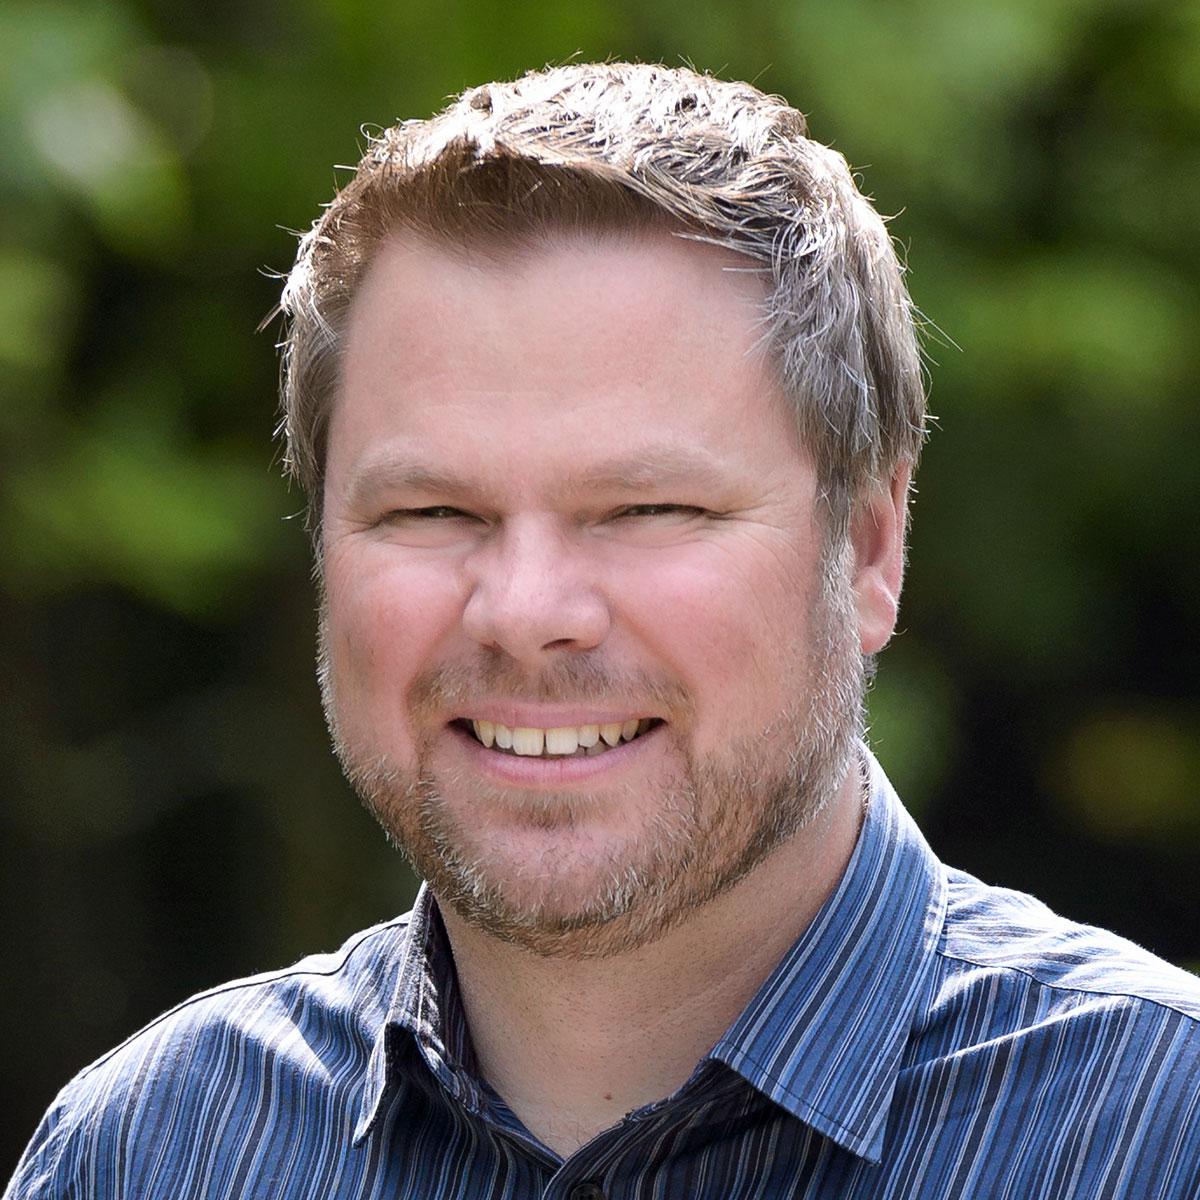 Headshot of Jed Looker